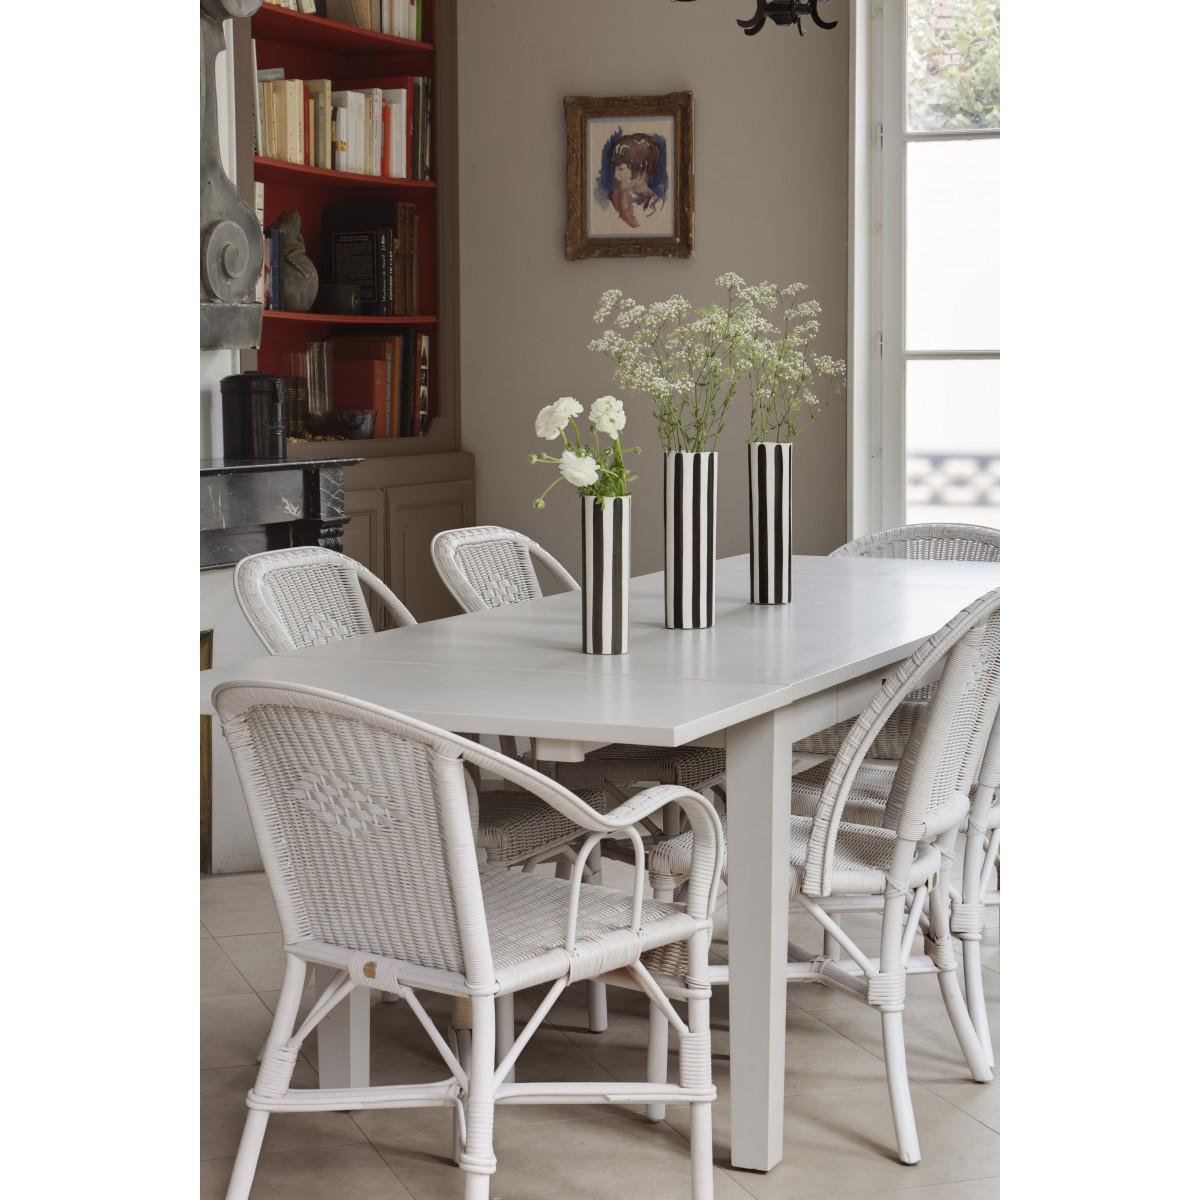 Chaise grand pere en moelle de rotin blanc - Meubles en rotin blanc ...